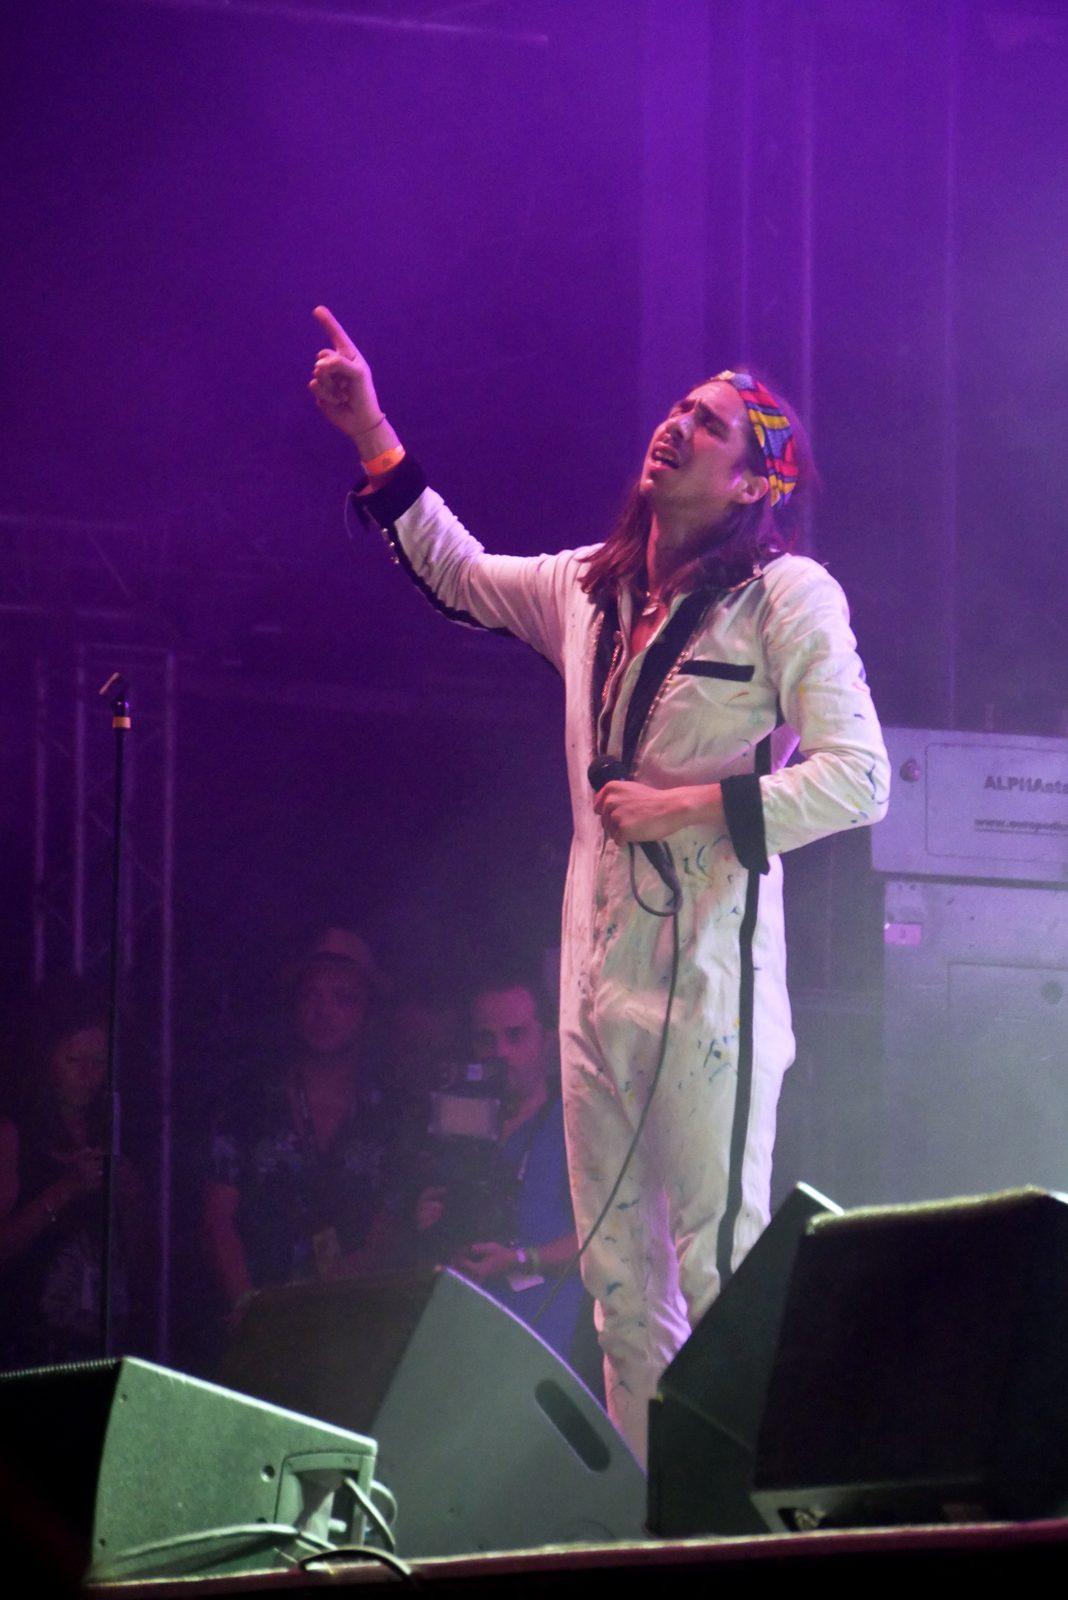 David Boring Naive New Beaters concert Rock en Seine 2016 festival paris photo scène usofparis blog